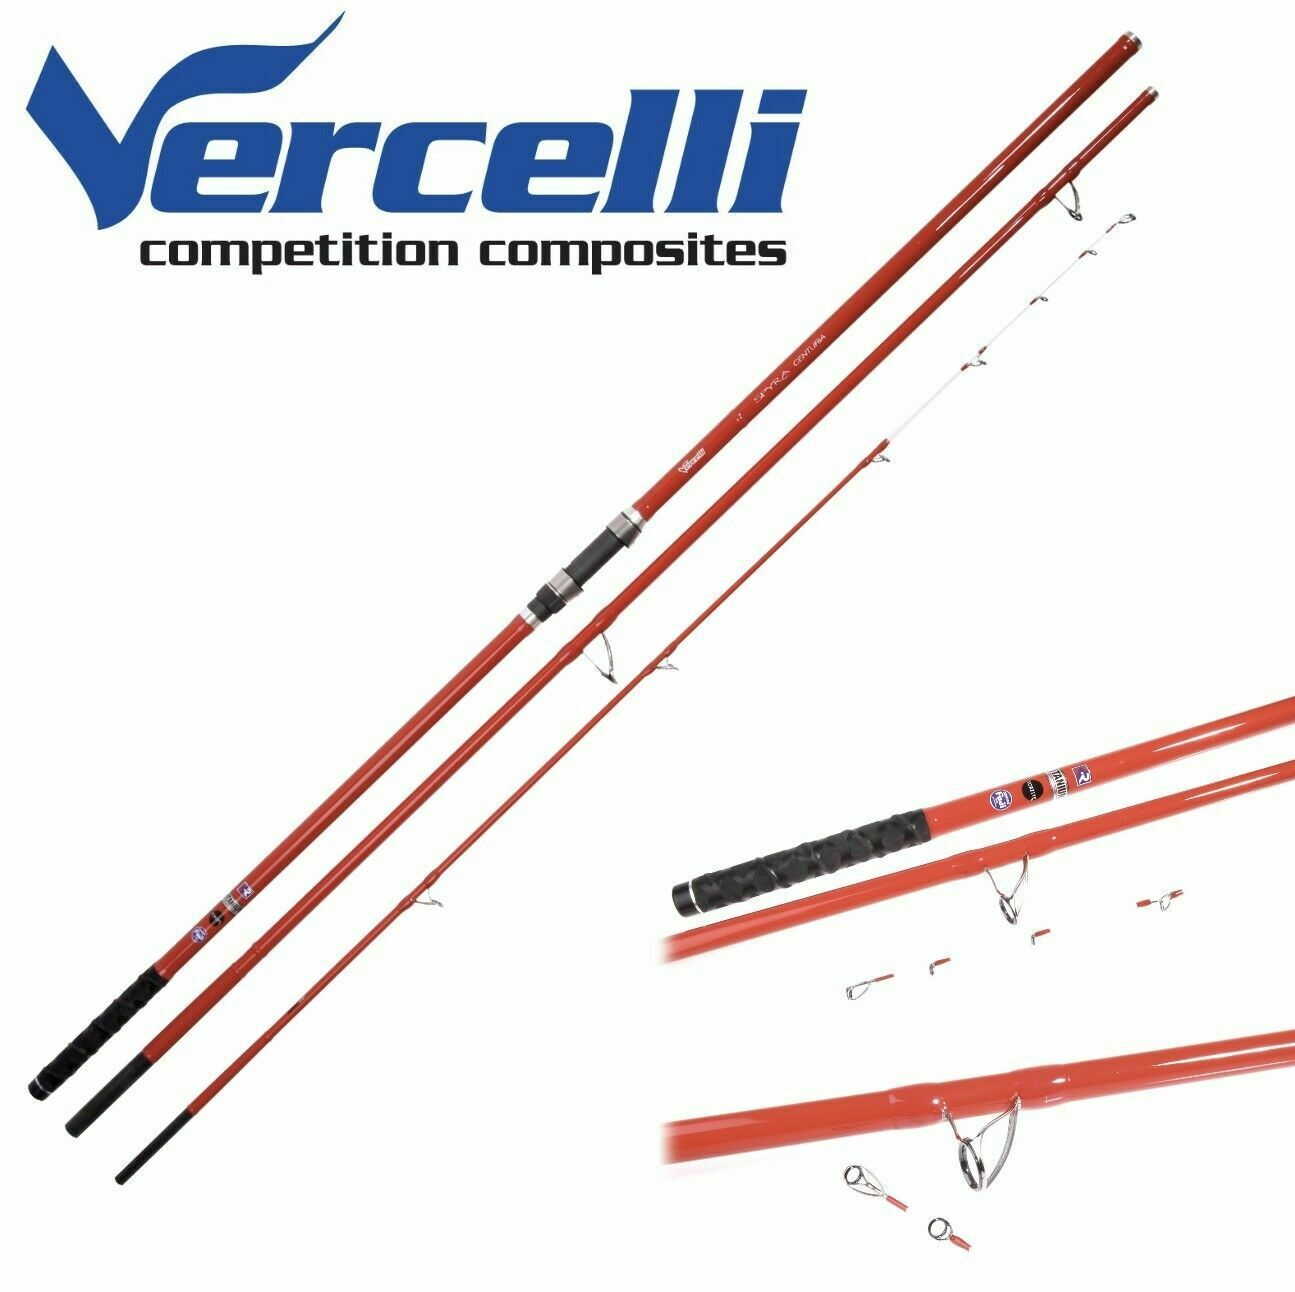 Caña Vercelli Spyra Varilla de competencia Composites Surfcasting centuria